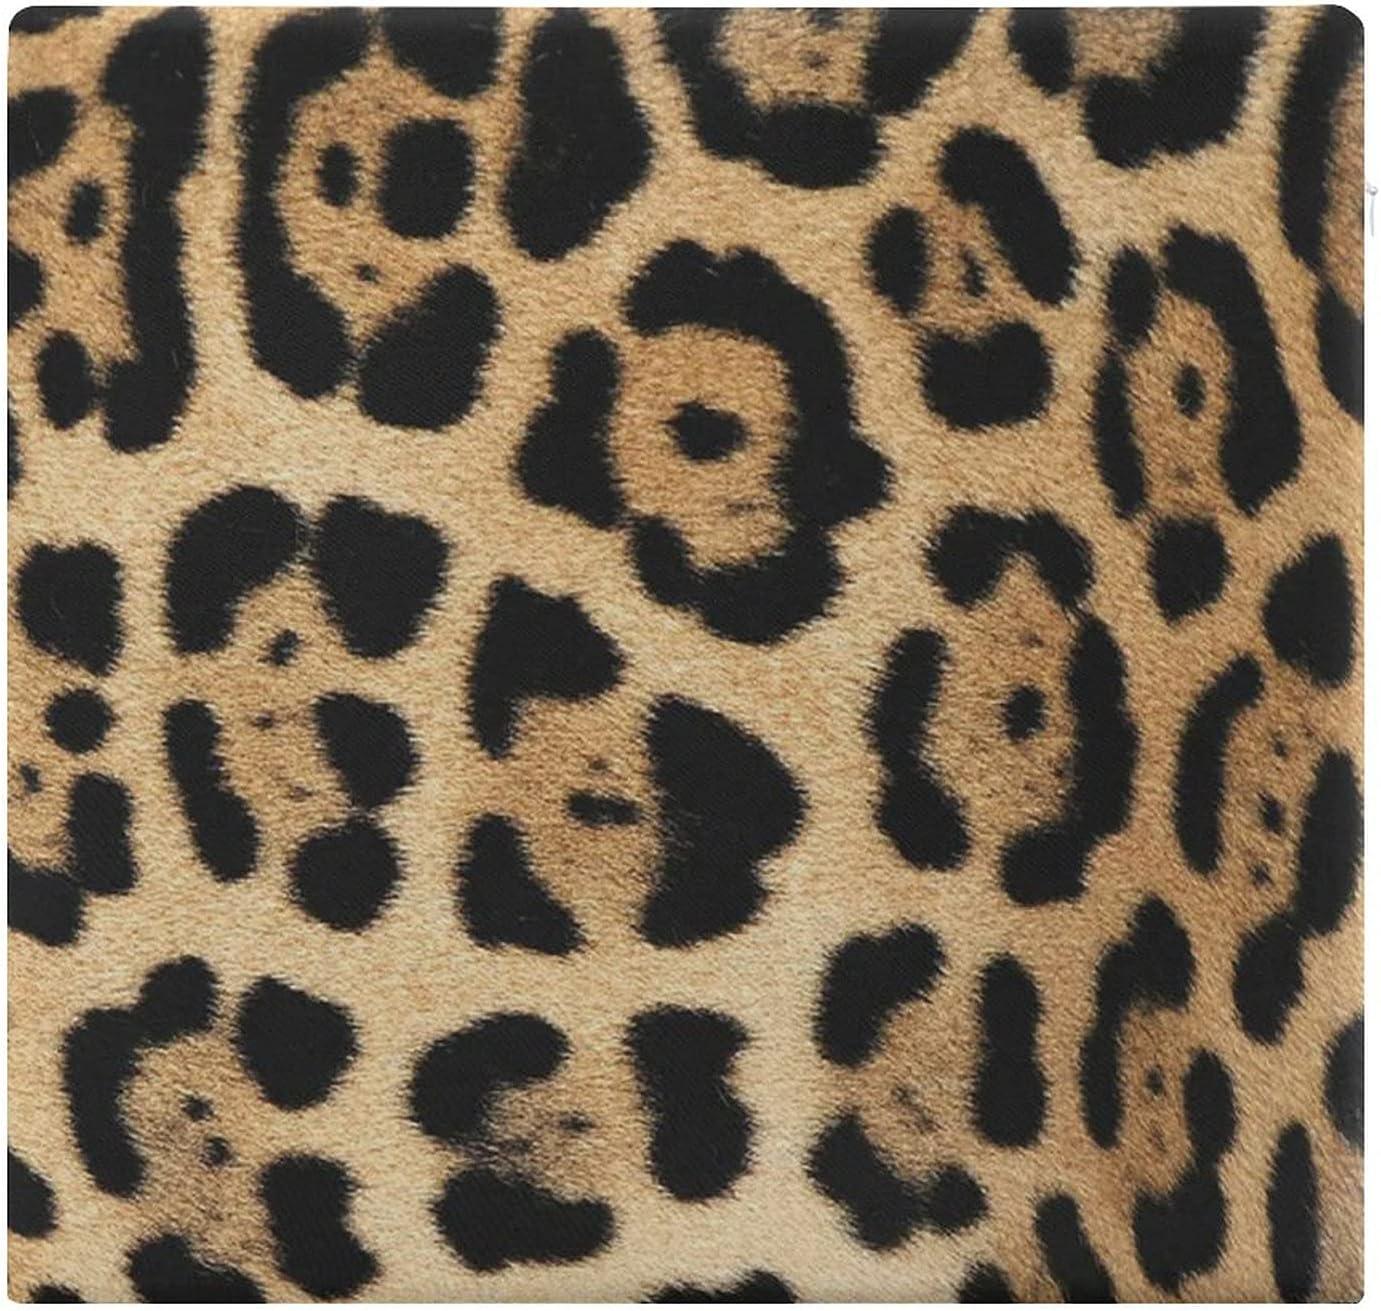 Cojines de Suelo Cuadrados,Cojín de Asiento de cojín de Silla,Cerca de Jaguar o Pantera Onca mostrando Marcas de patrón de,Sentado para Oficina,hogar,Suave Espesar